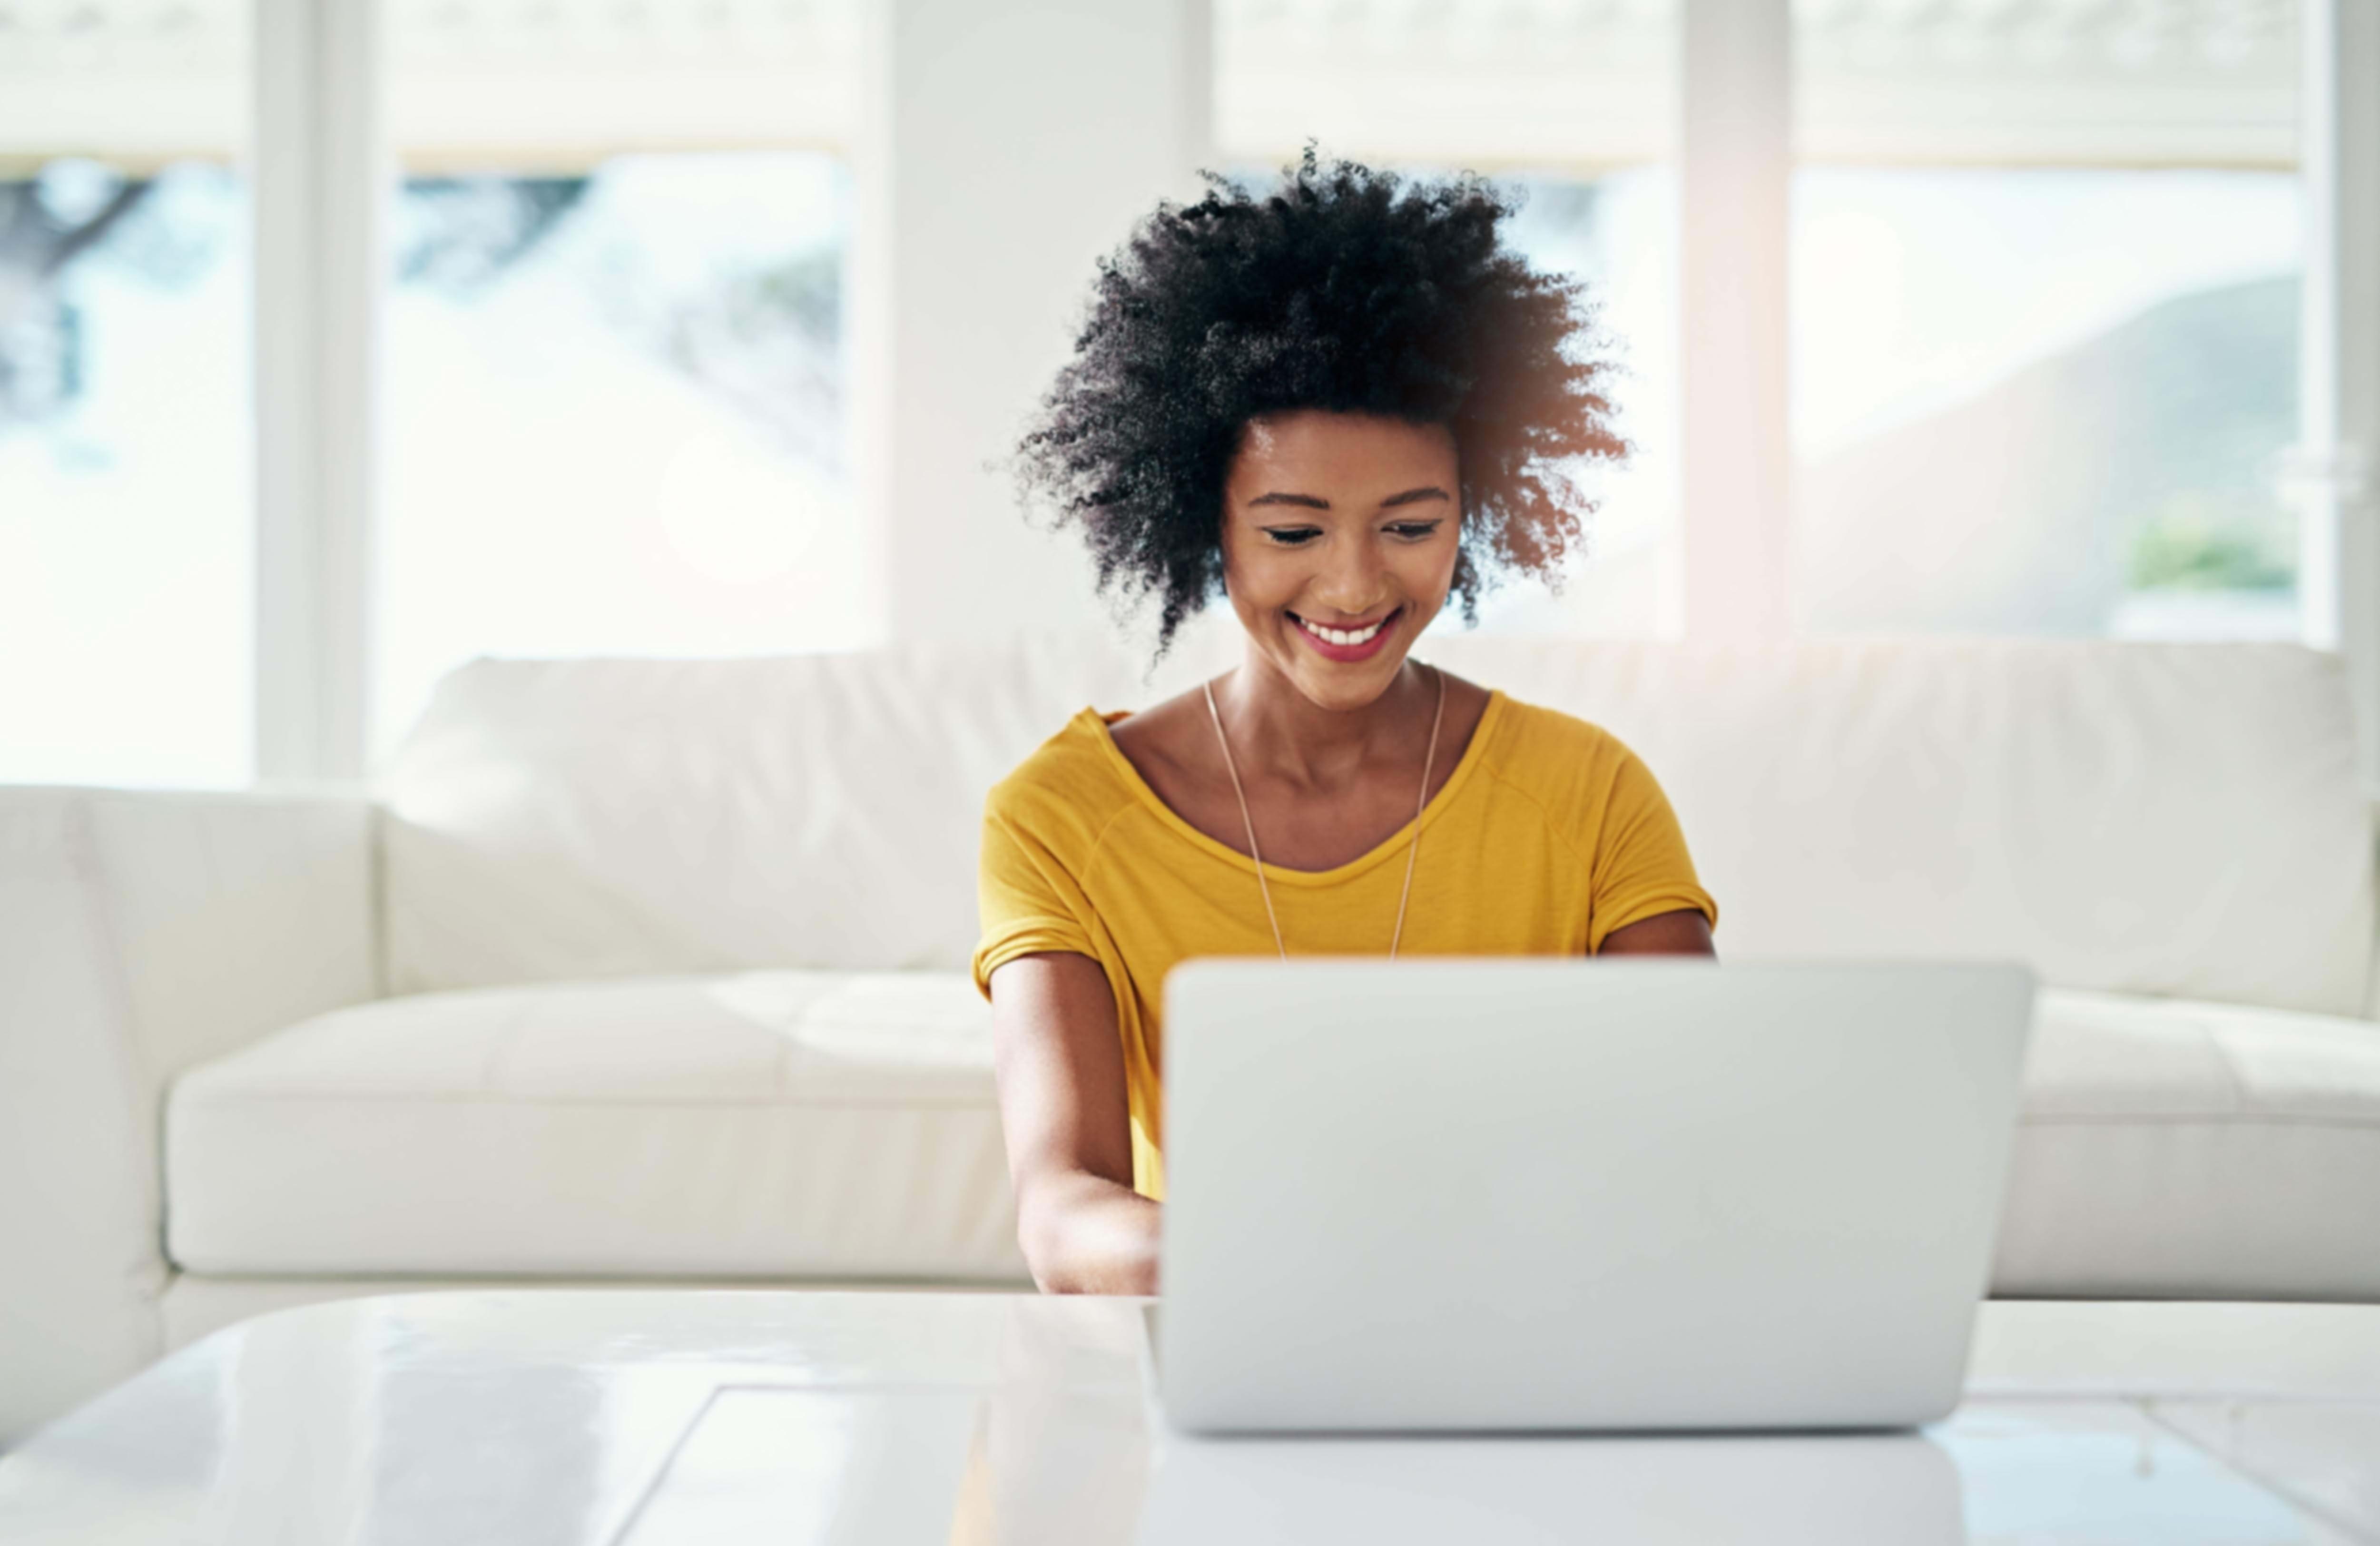 Woman, smiling, looking at laptop screen.